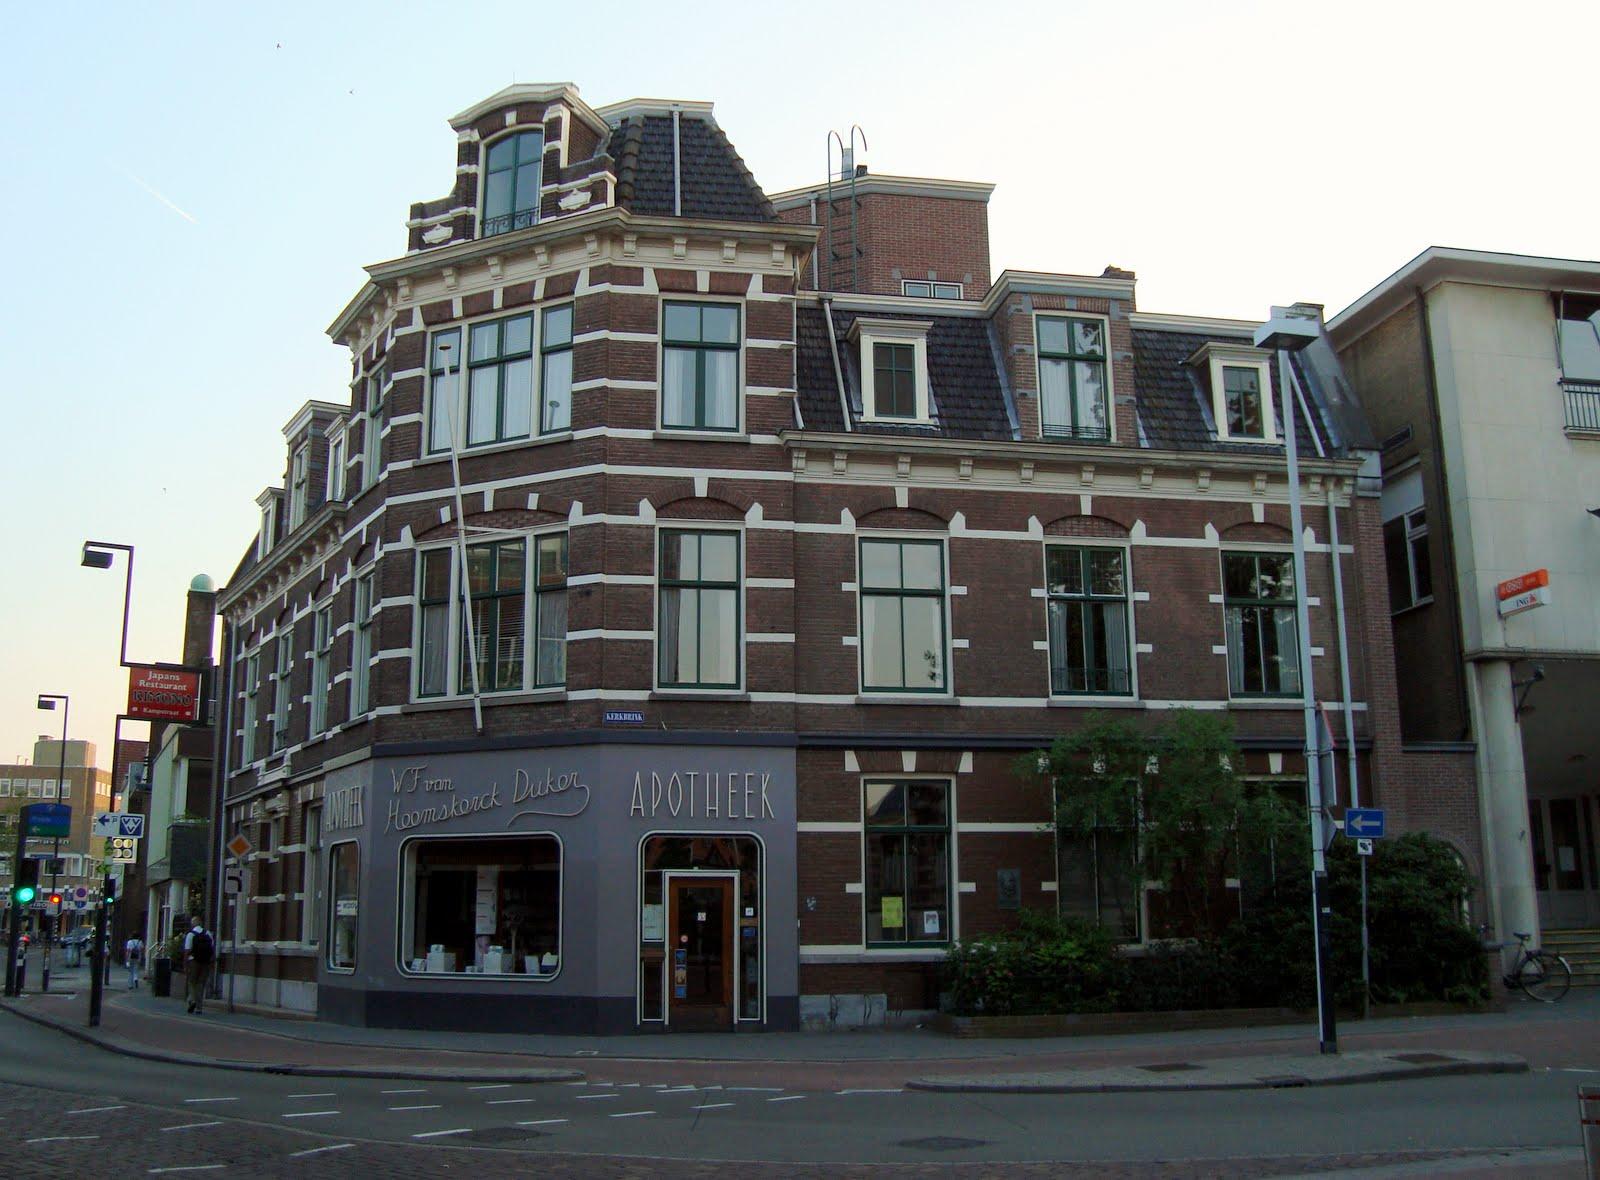 Hilversum winkels open gallery of hilversum winkels open for Kruidvat ijmuiden